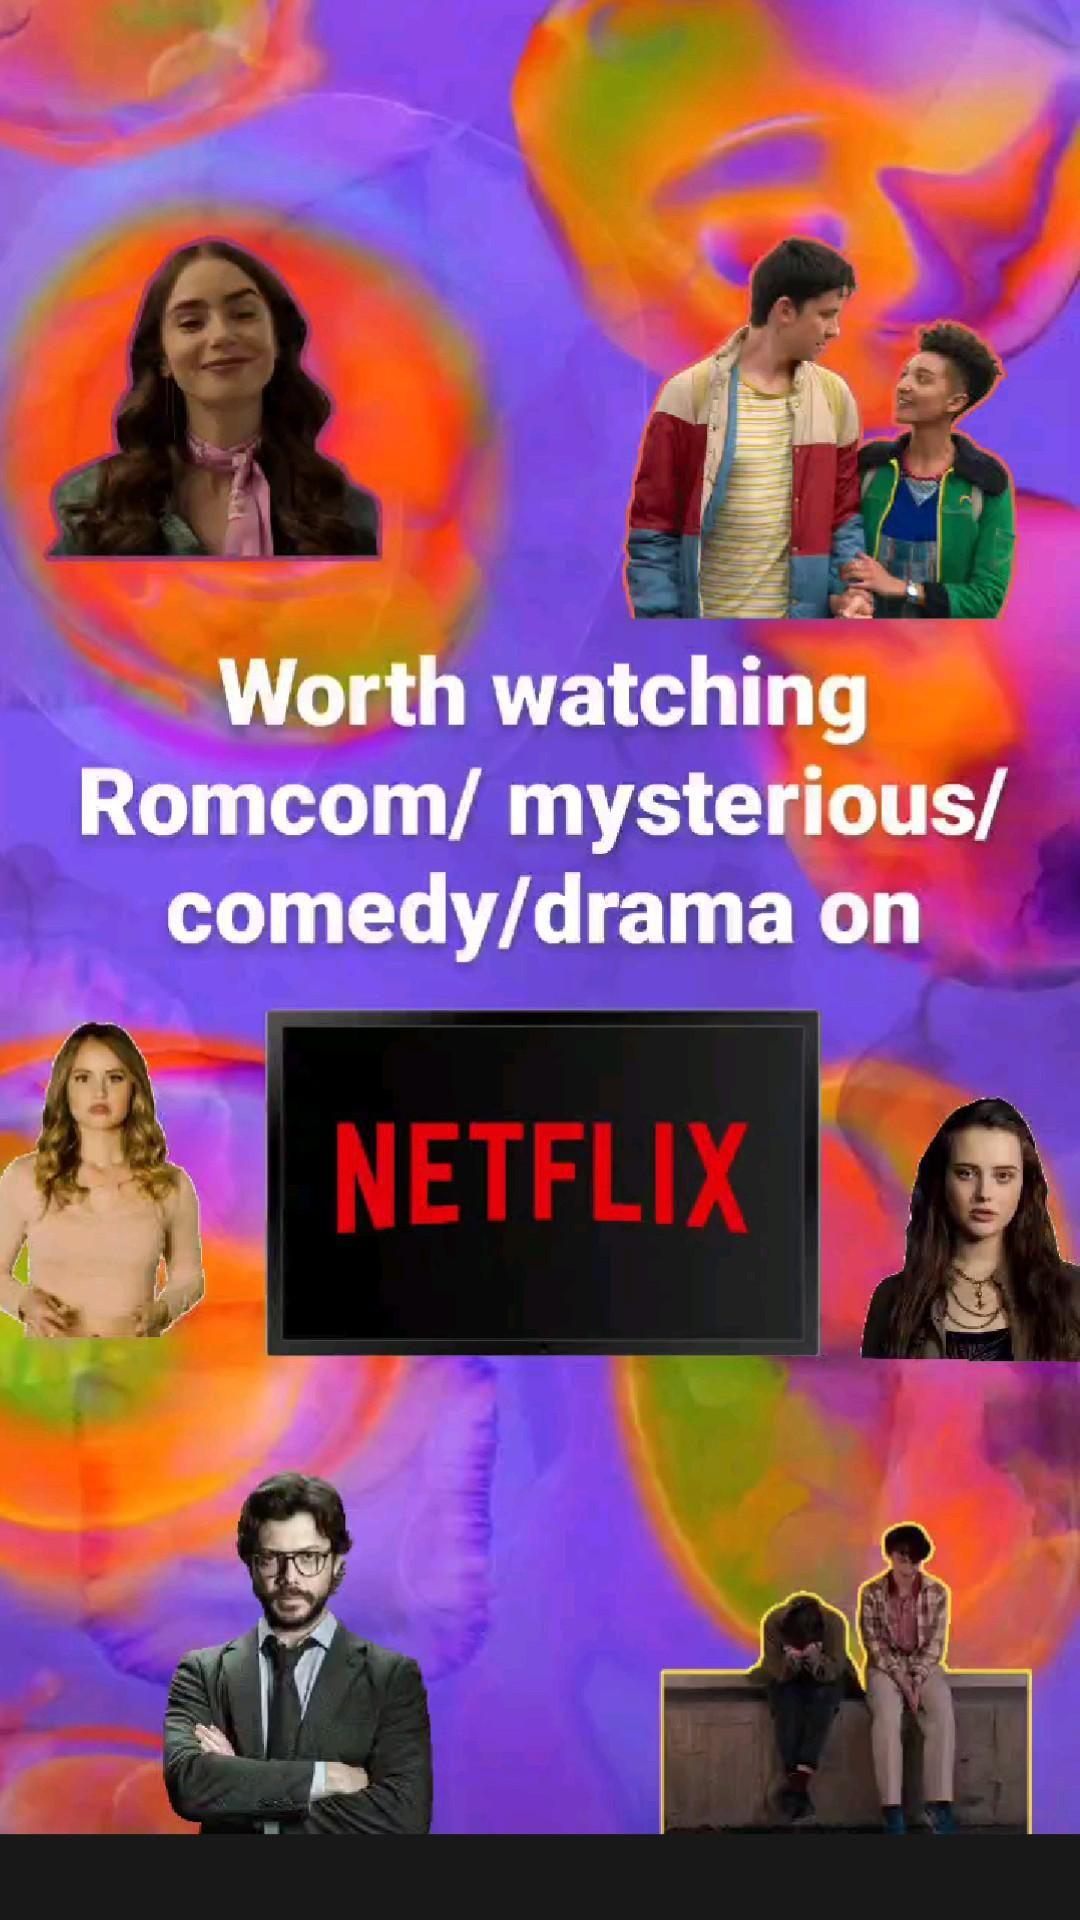 Worth watching series less than 4 seasons on Netflix.